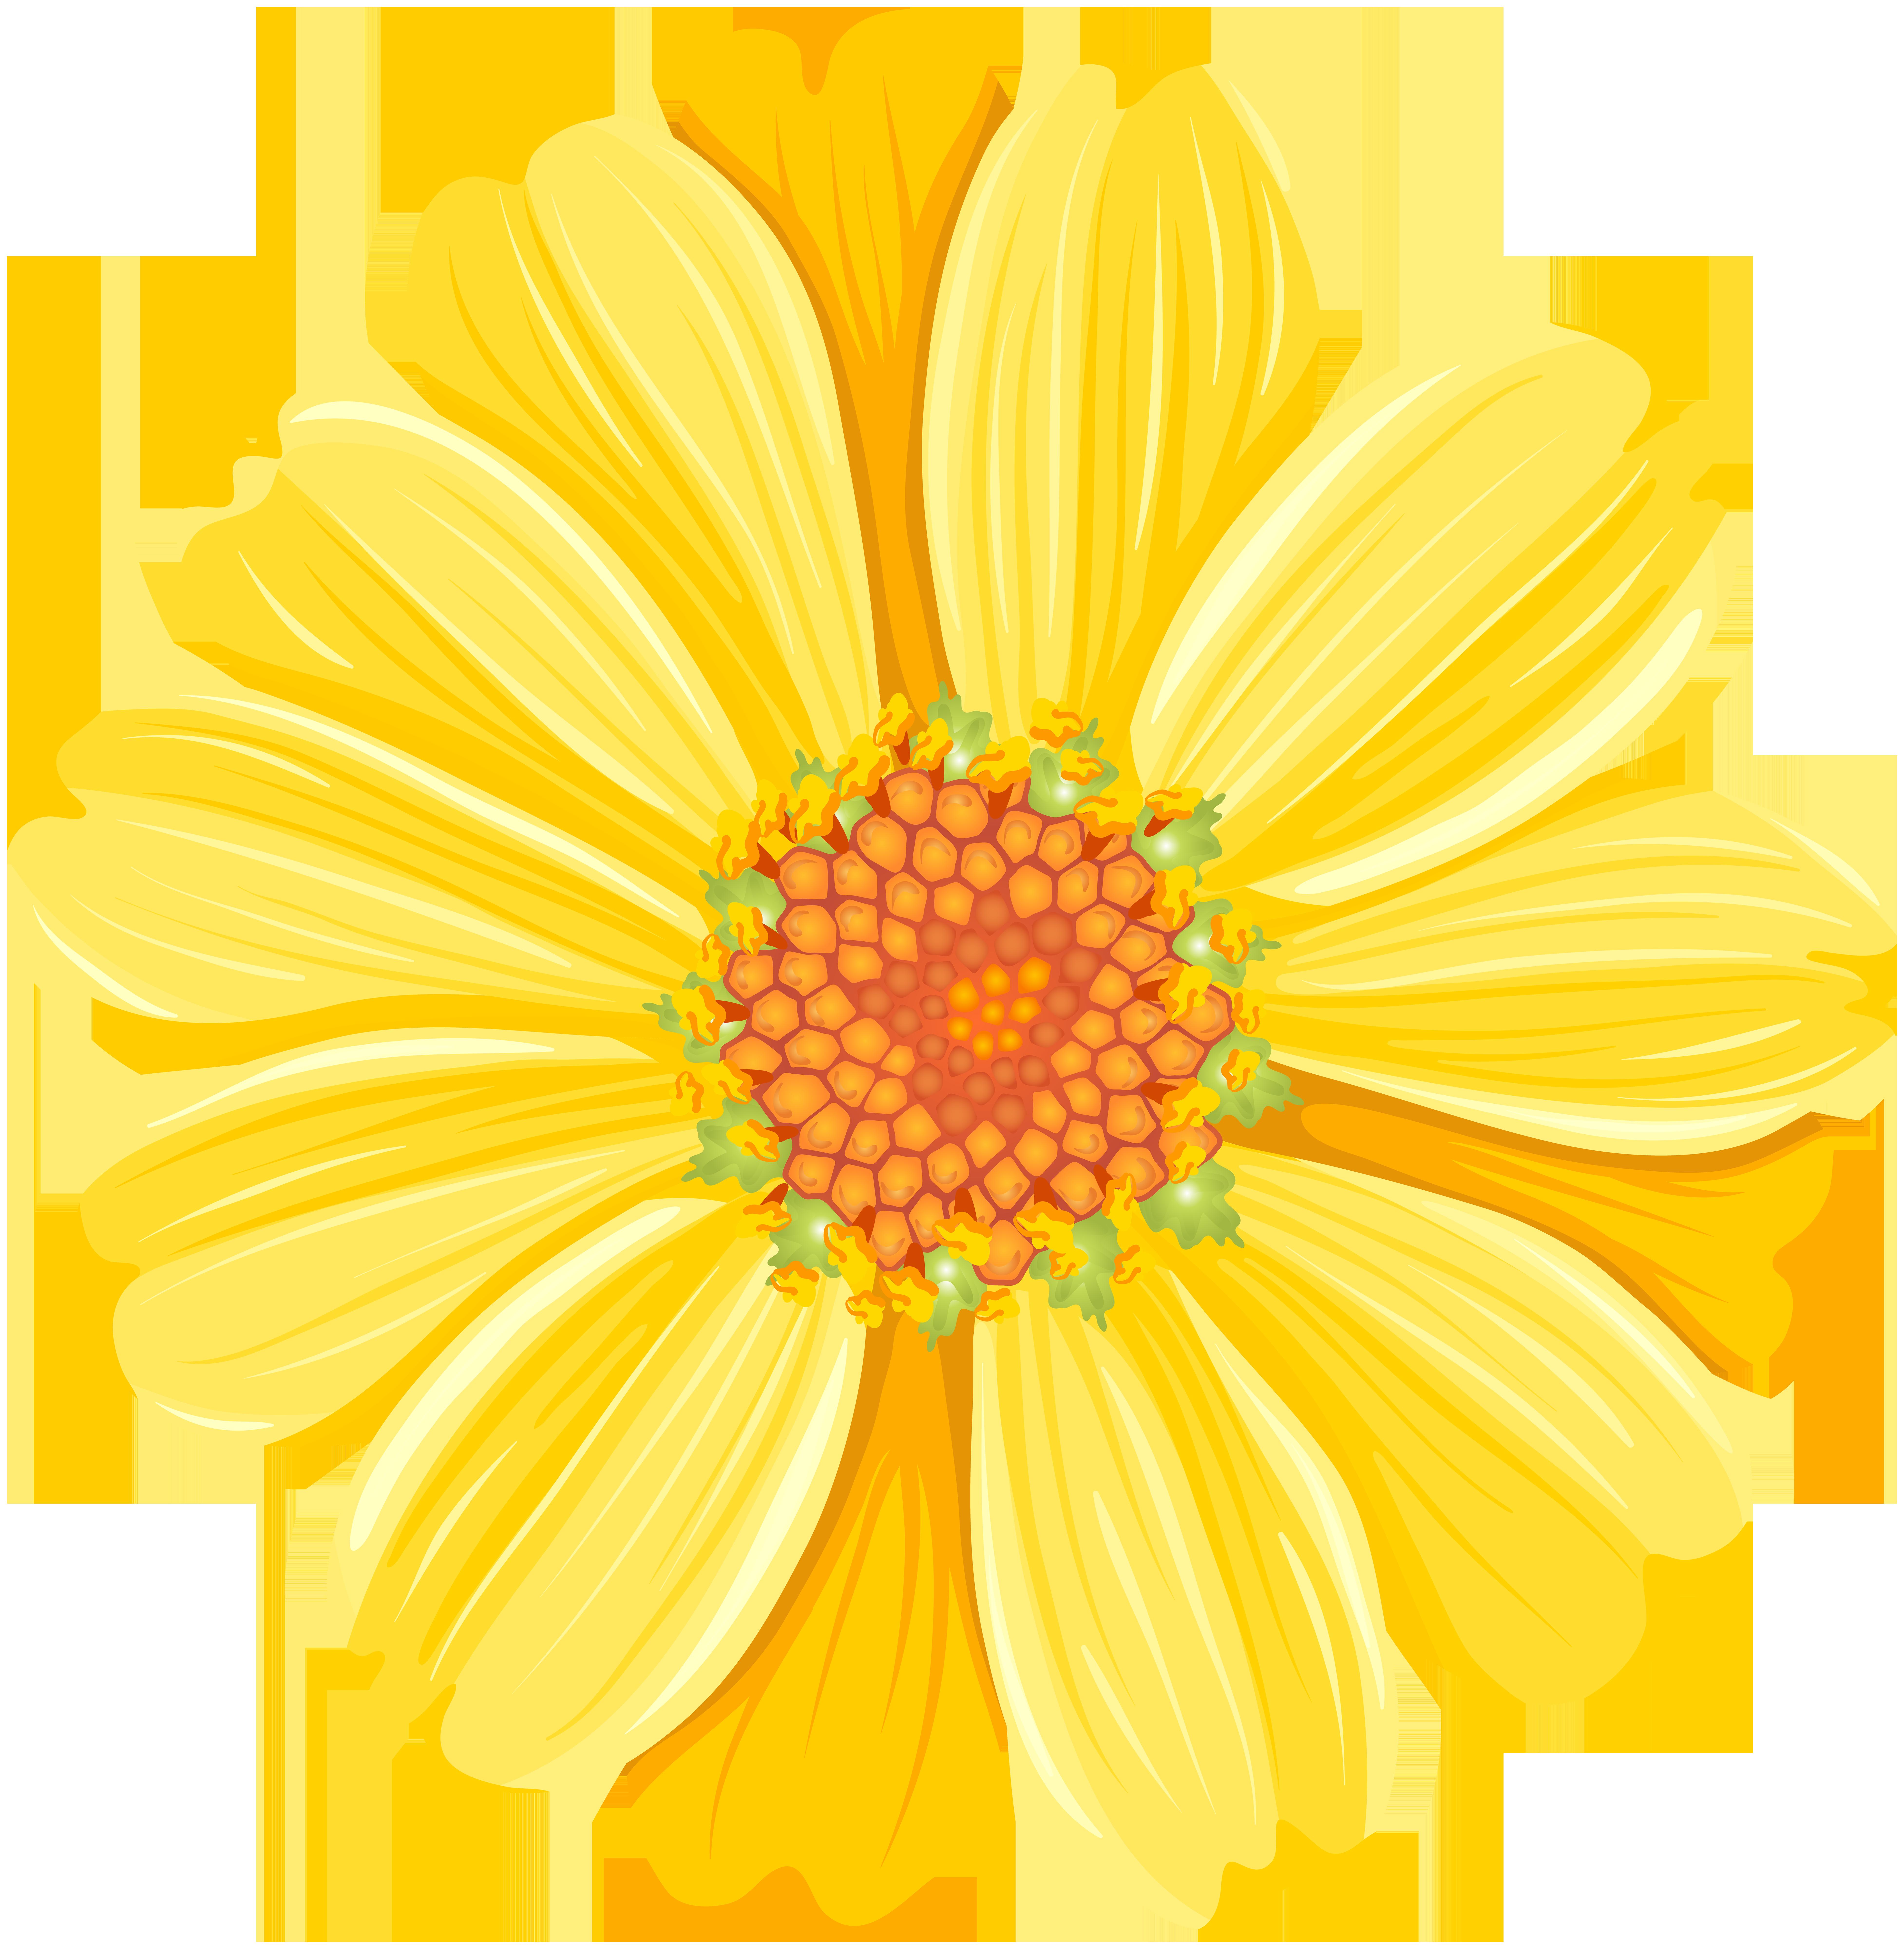 Daisy clipart shasta daisy. Yellow png transparent clip